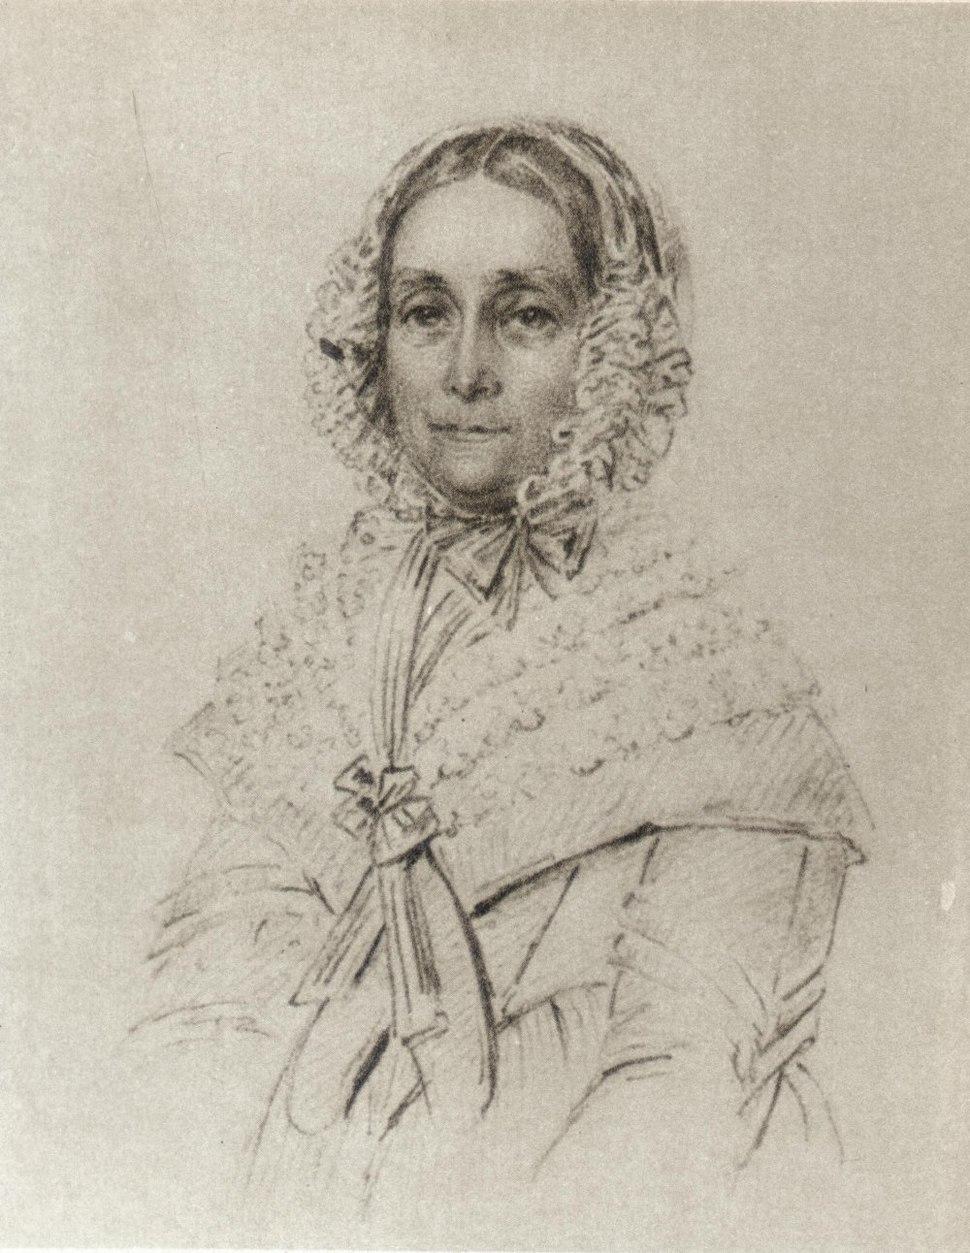 Malla Silfverstolpe 1843